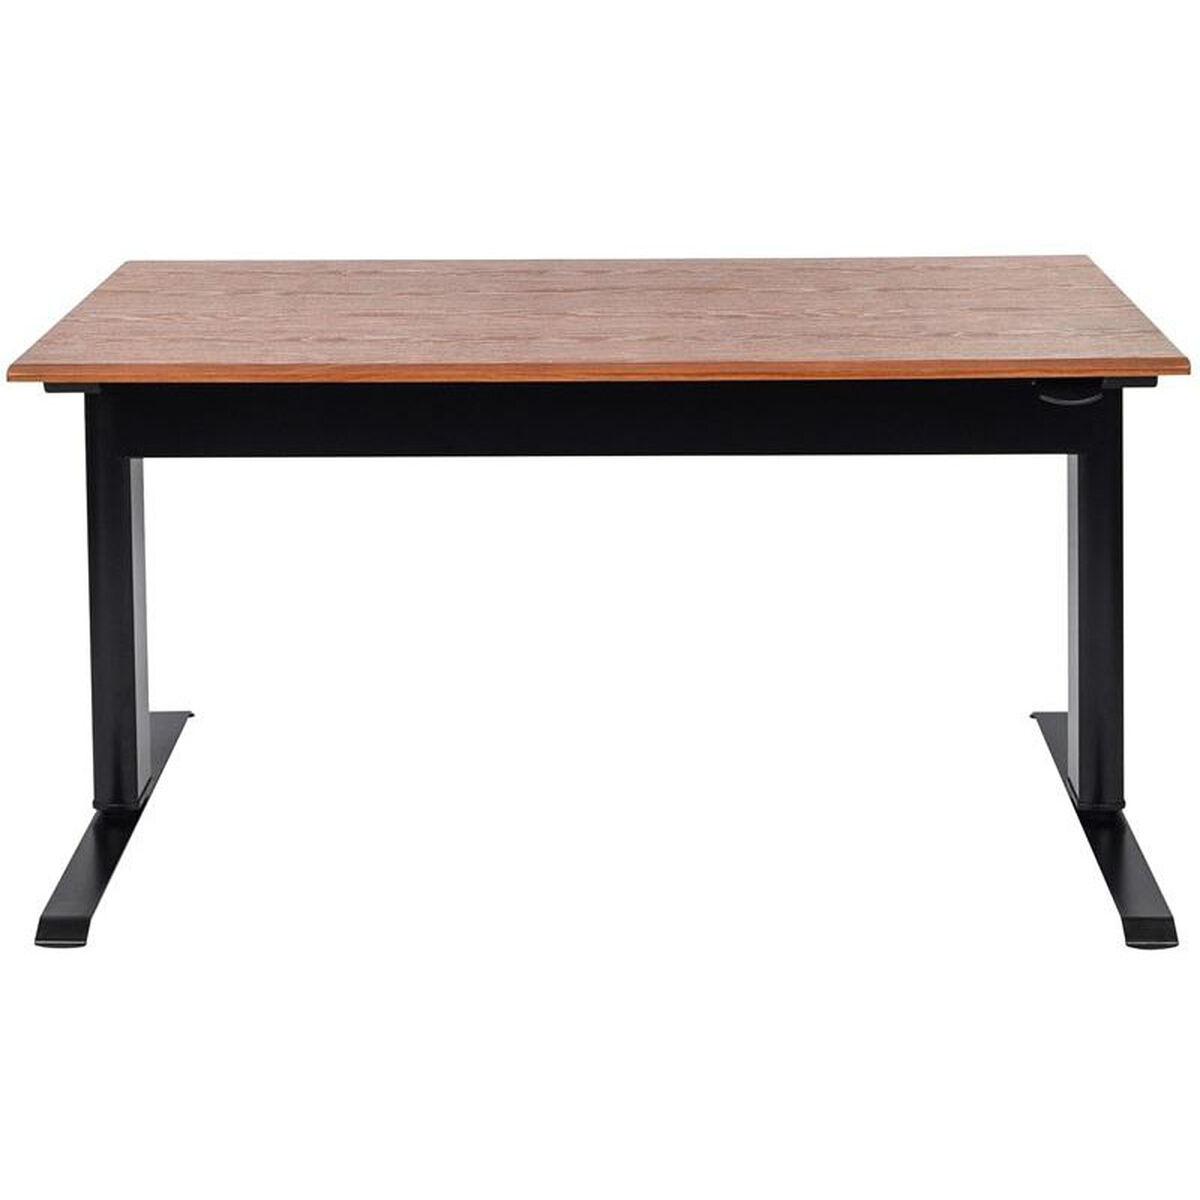 Pneumatic Teak Standing Desk Spn56f Bk Tk Bizchair Com